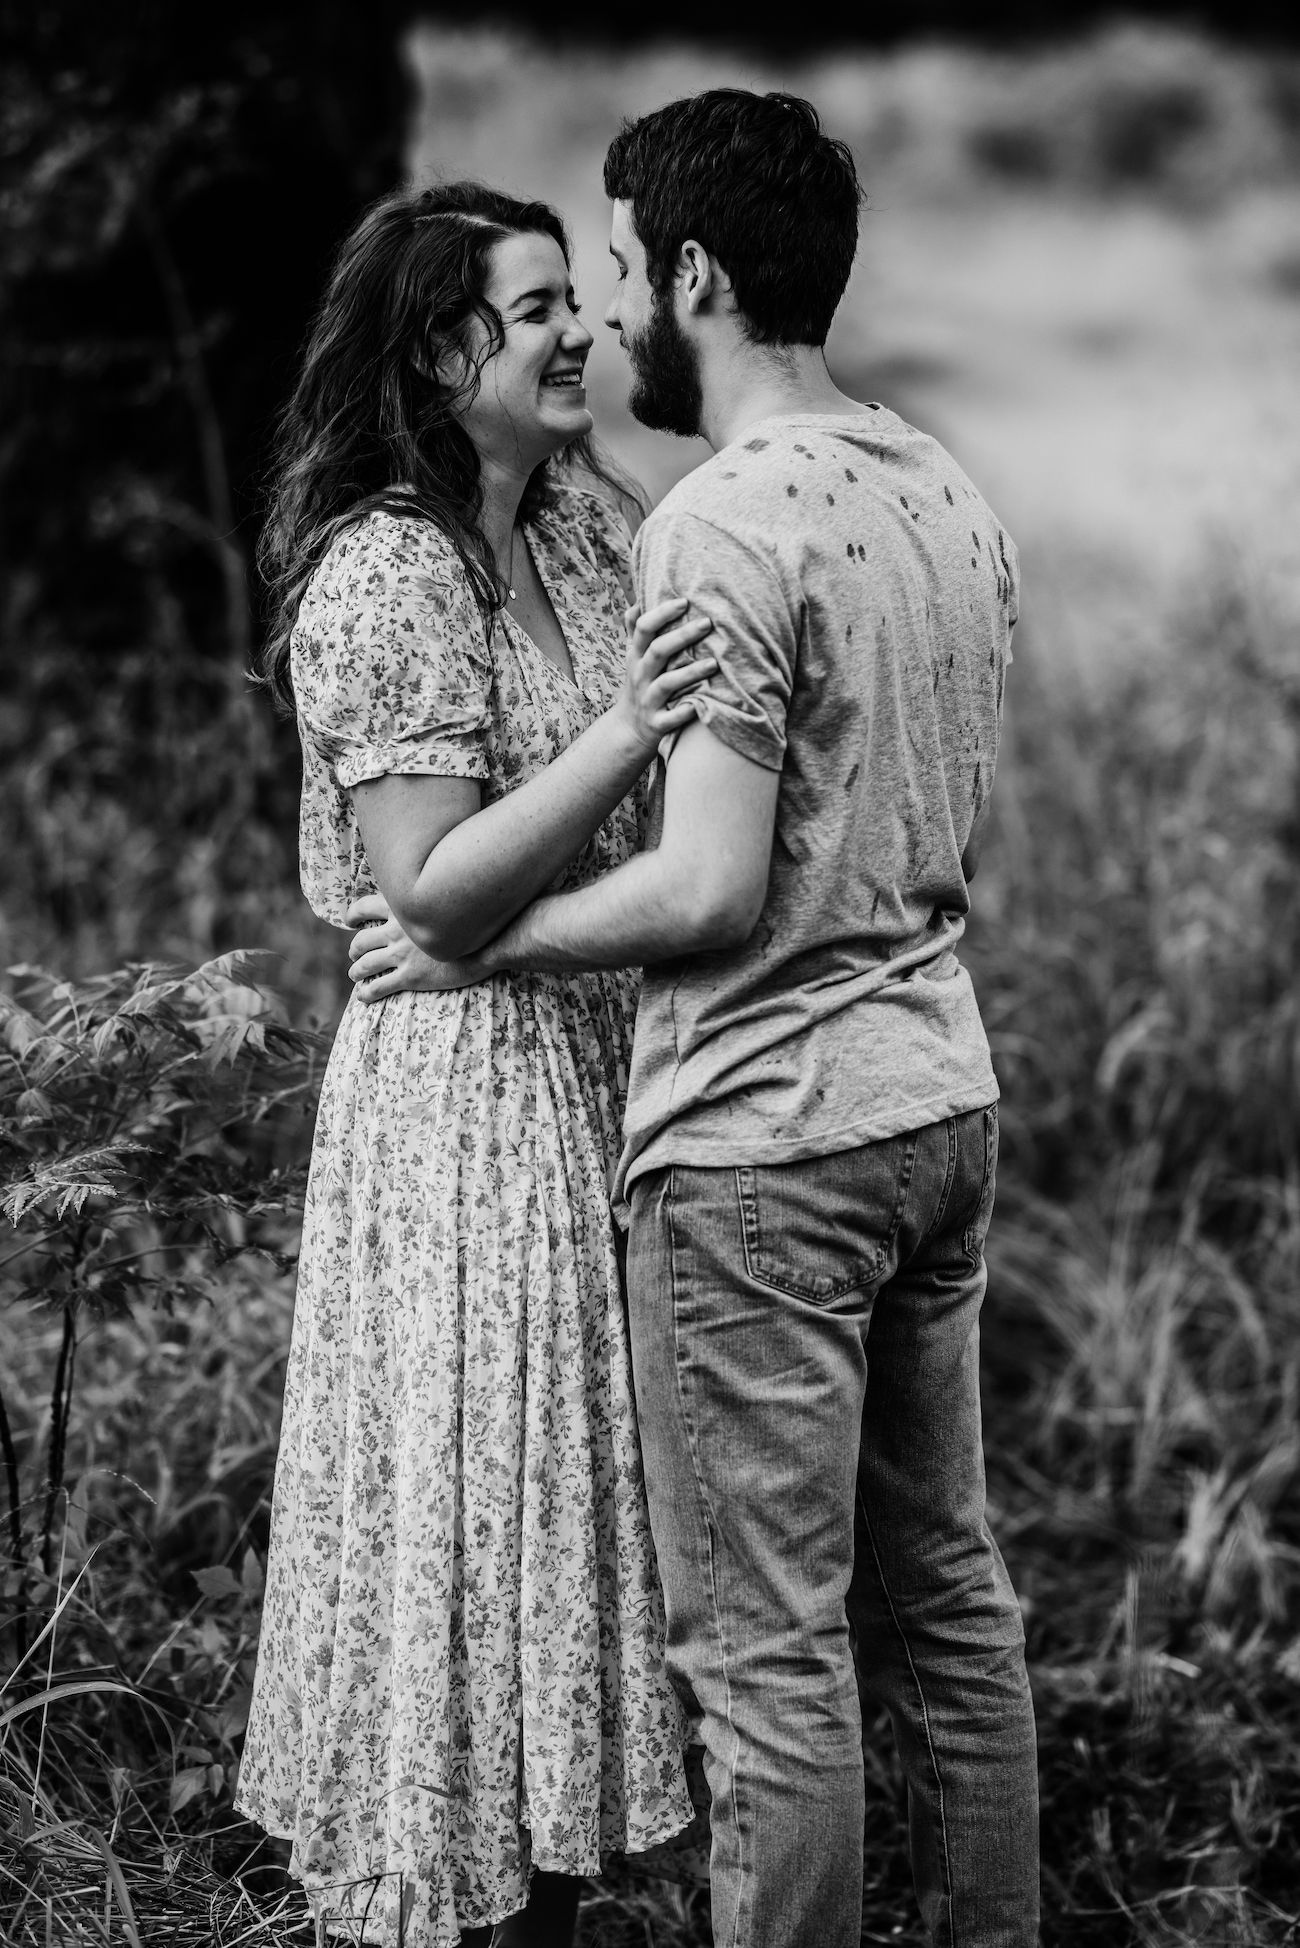 tampa-engagement-proposal-photography-79.jpeg